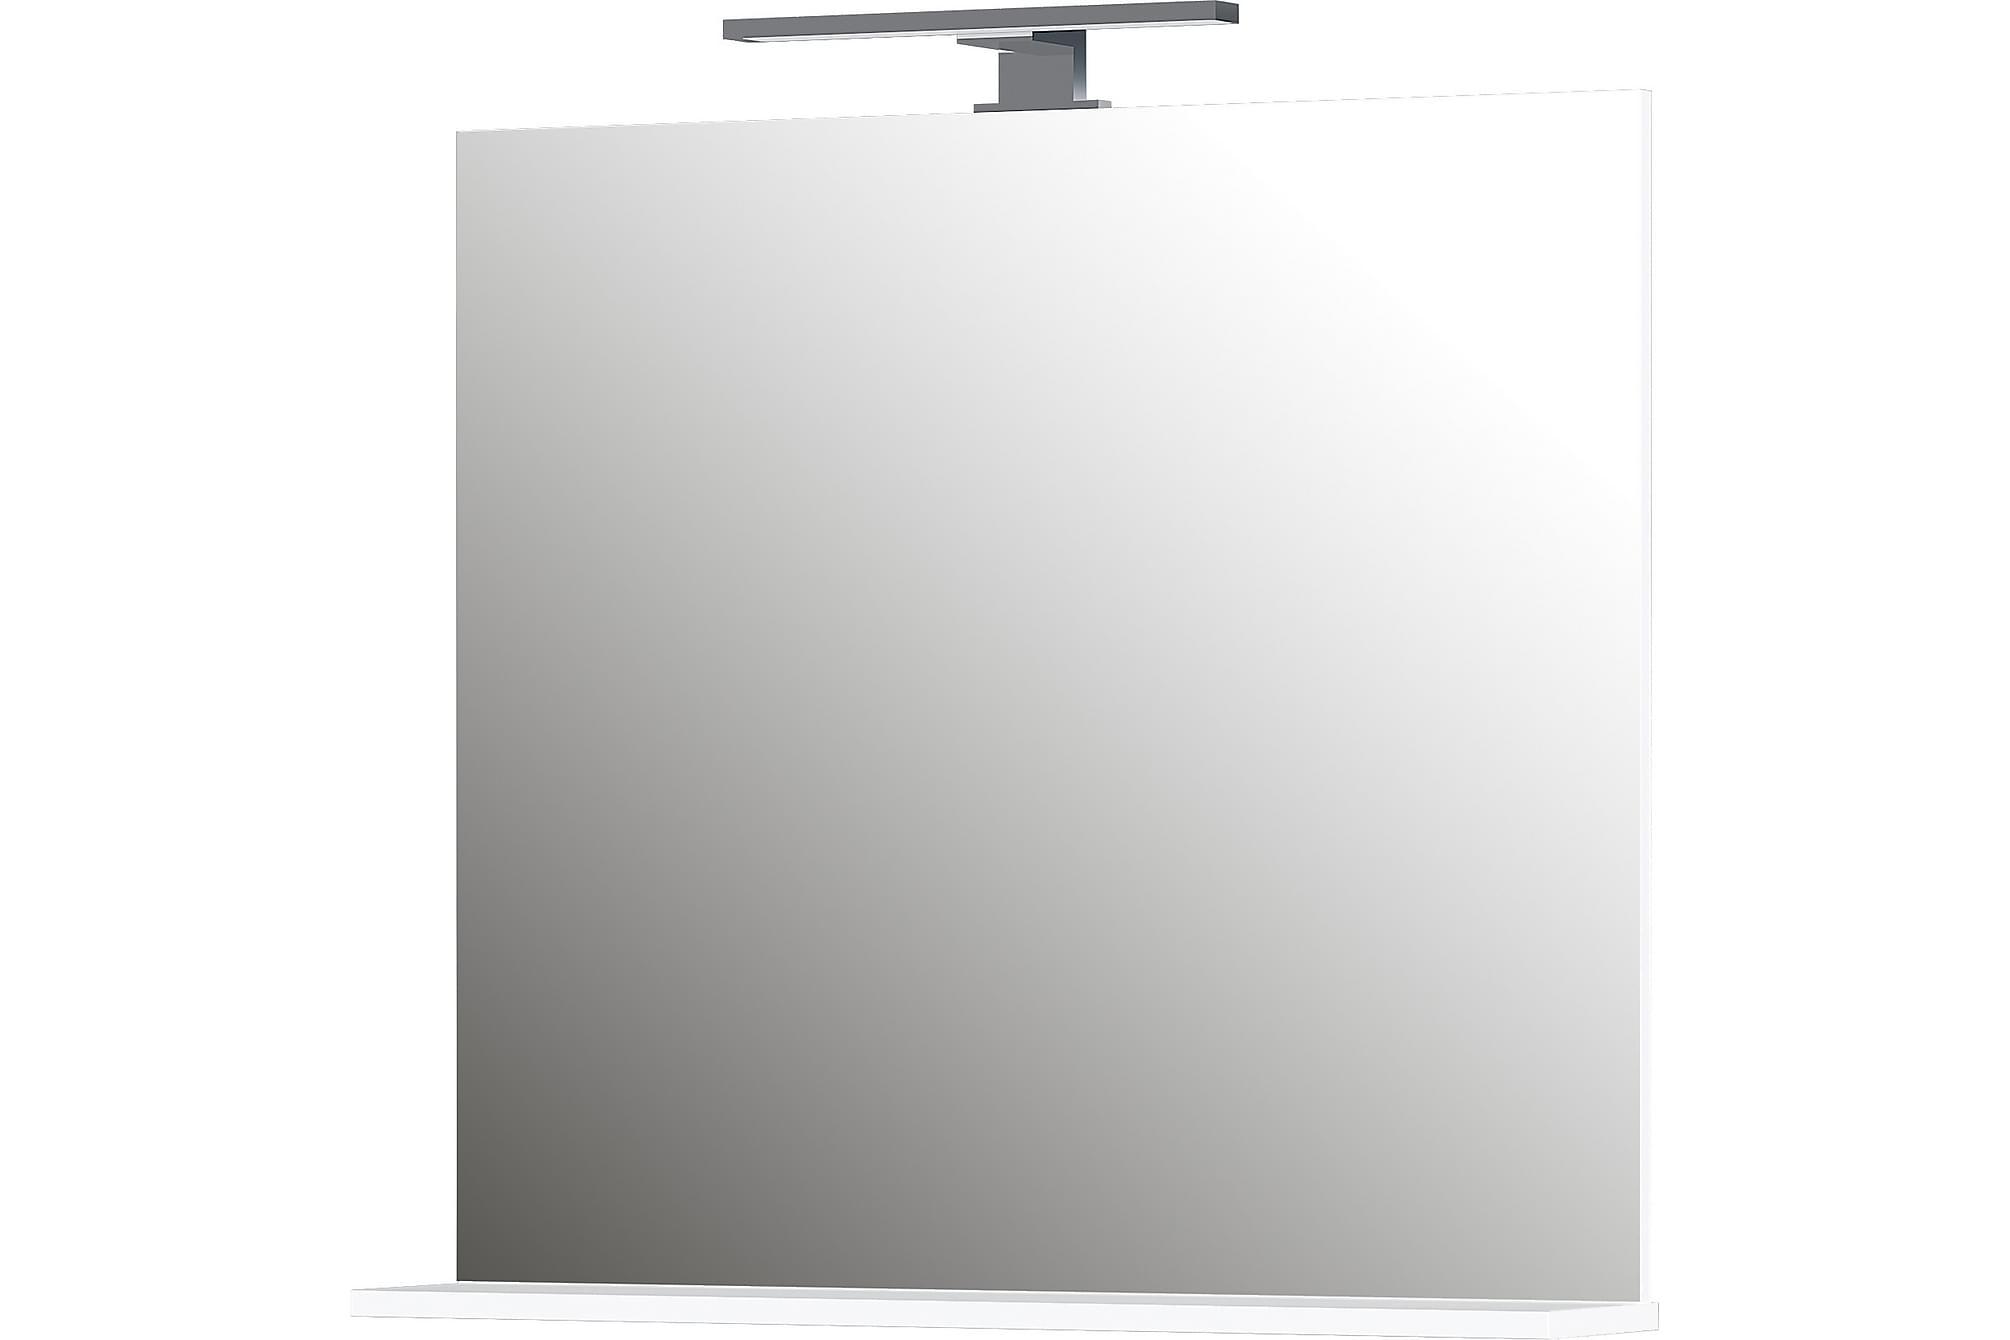 BLACOSSE Spegel Vit, Skoförvaring